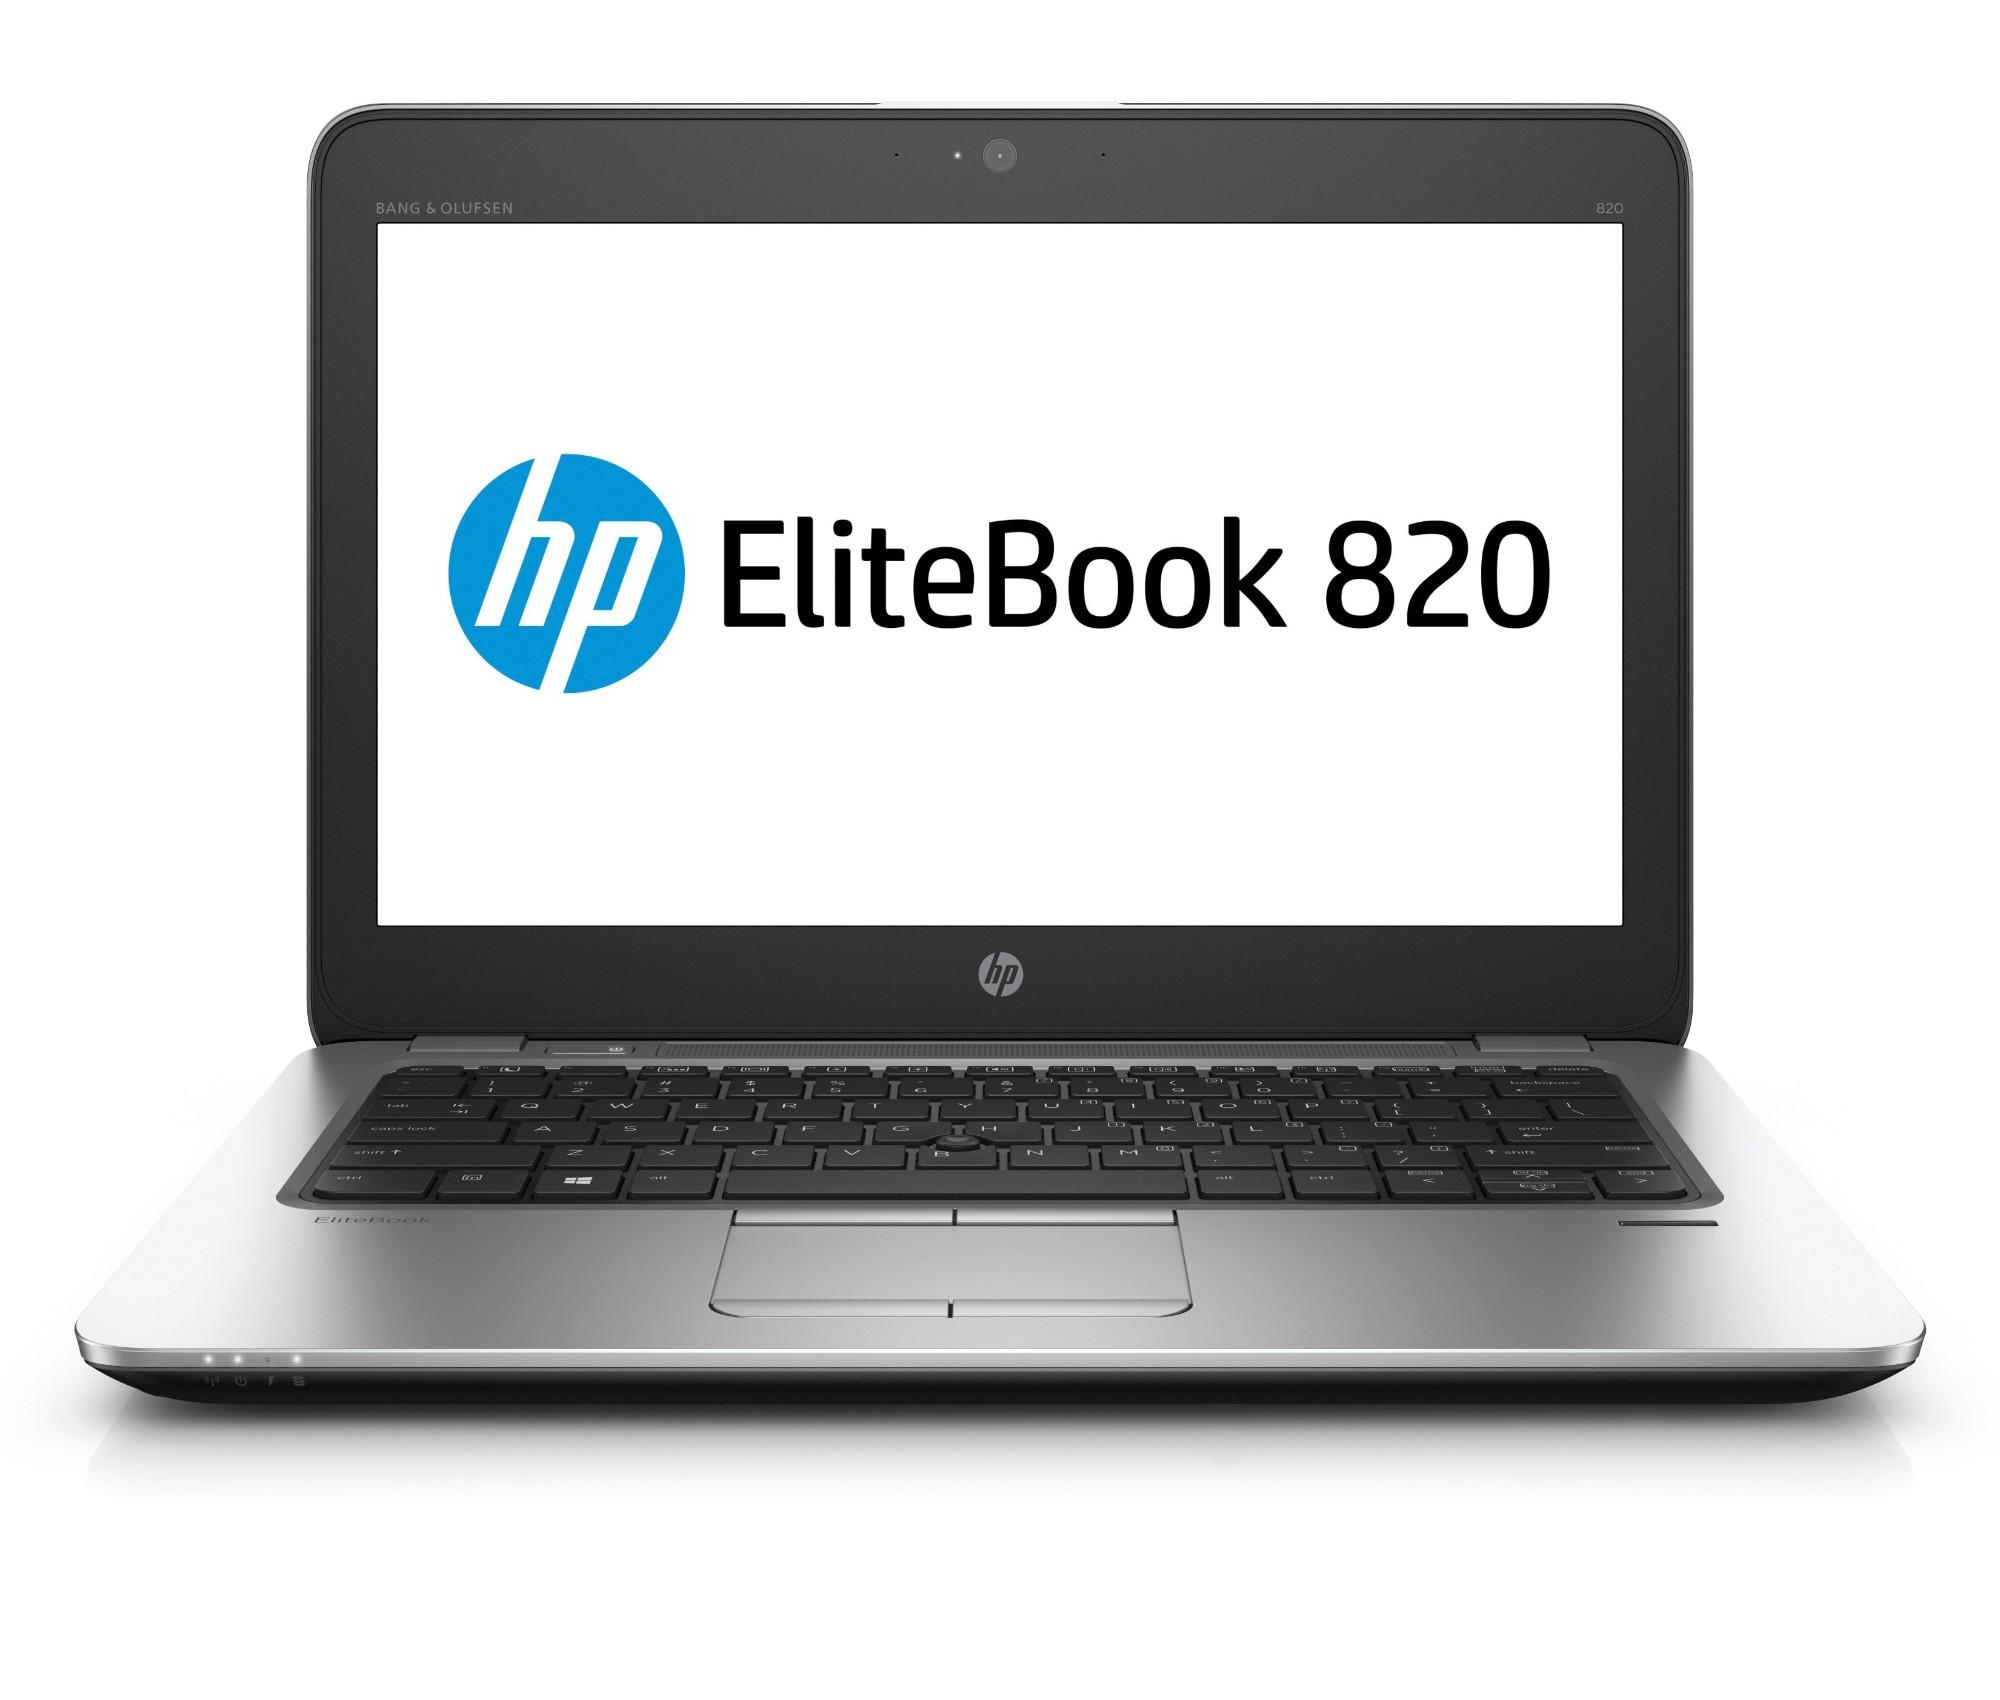 HP EliteBook 820 G3 2.5GHz i7-6500U 6th gen Intel® Core™ i7 12.5